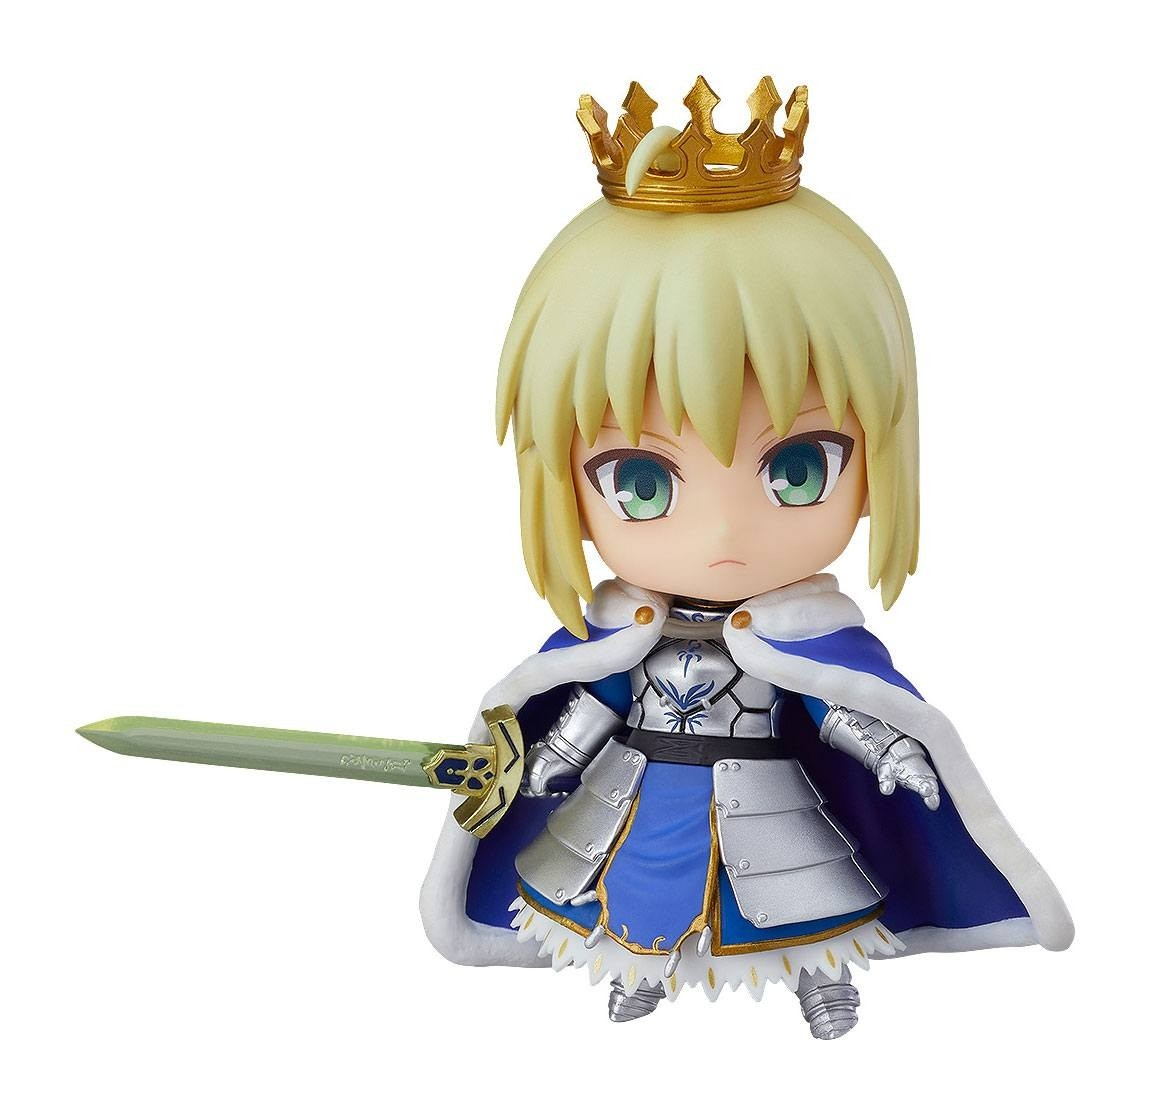 Fate/Grand Order Nendoroid Action Figure - Saber / Altria Pendragon: True Name Revealed Ver.